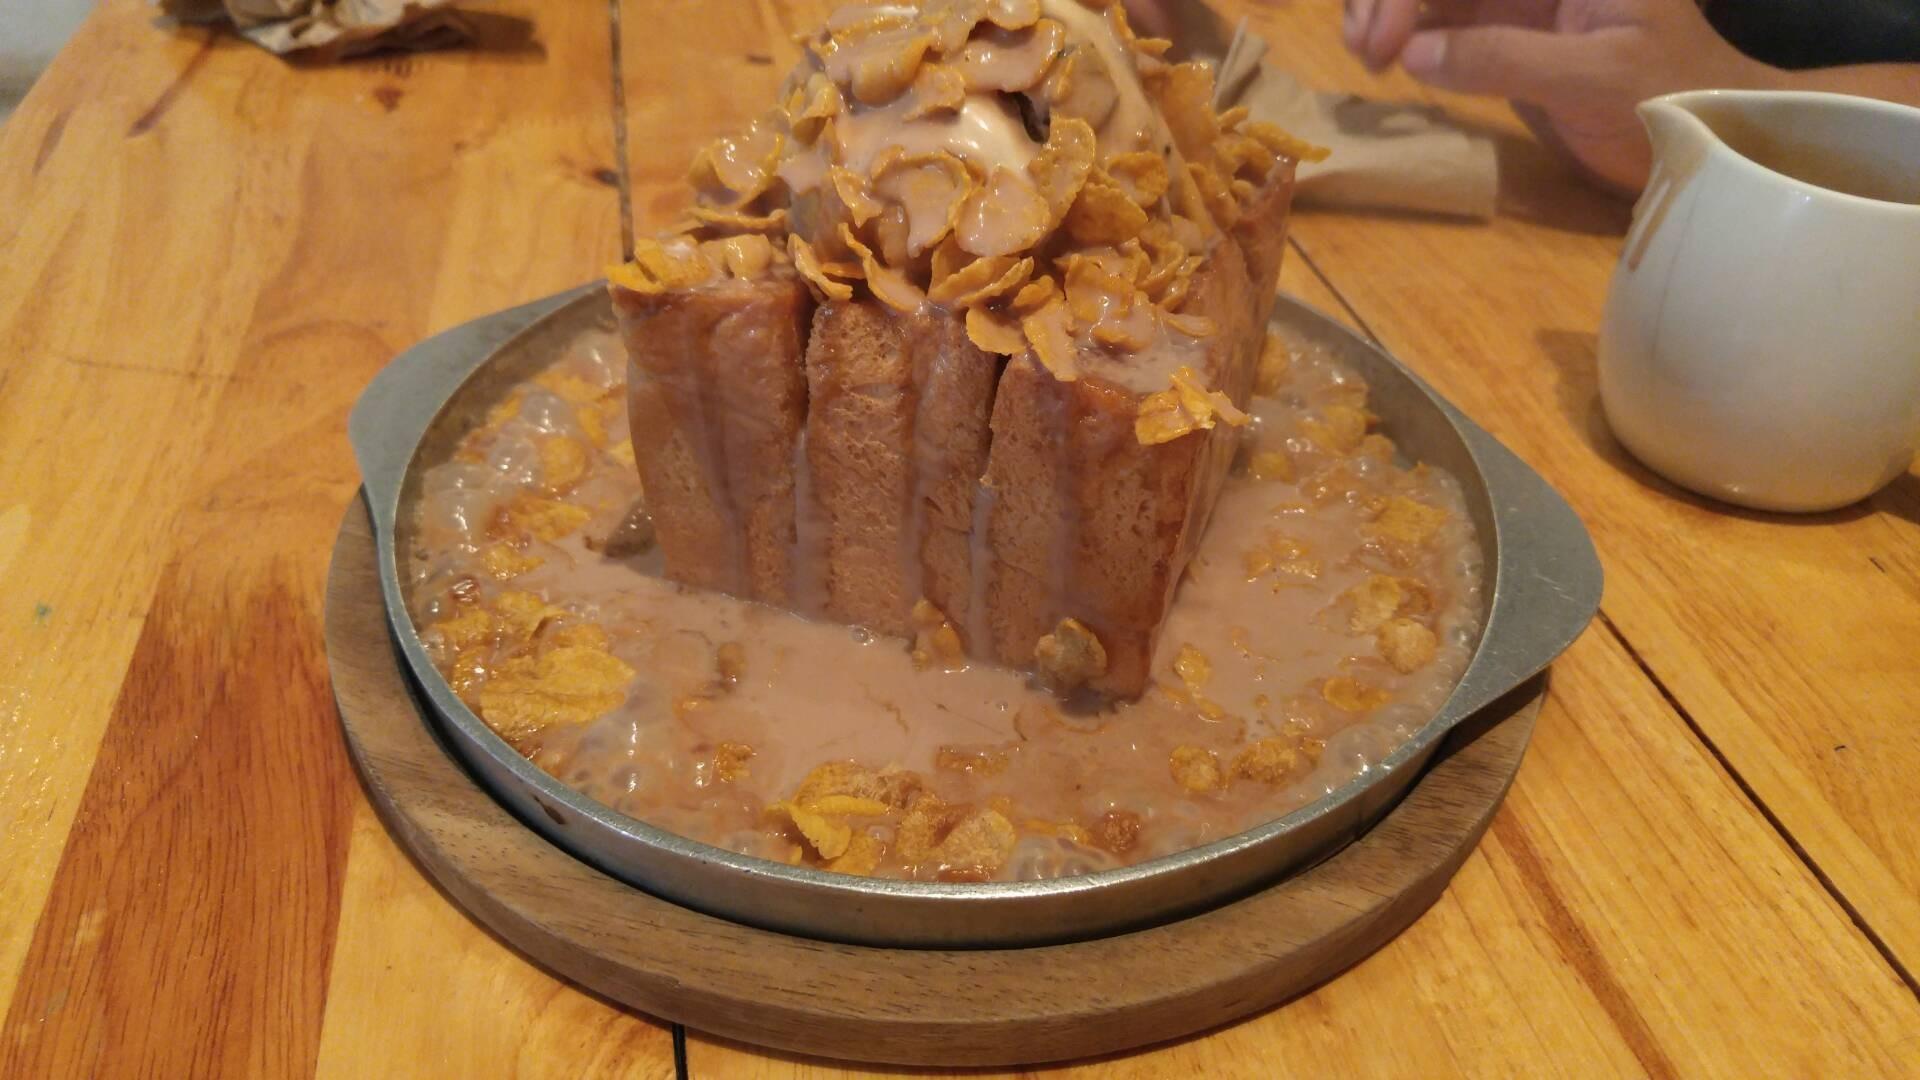 Sri Brown Cafe' สาขาหลังมหาวิทยาลัยขอนแก่น